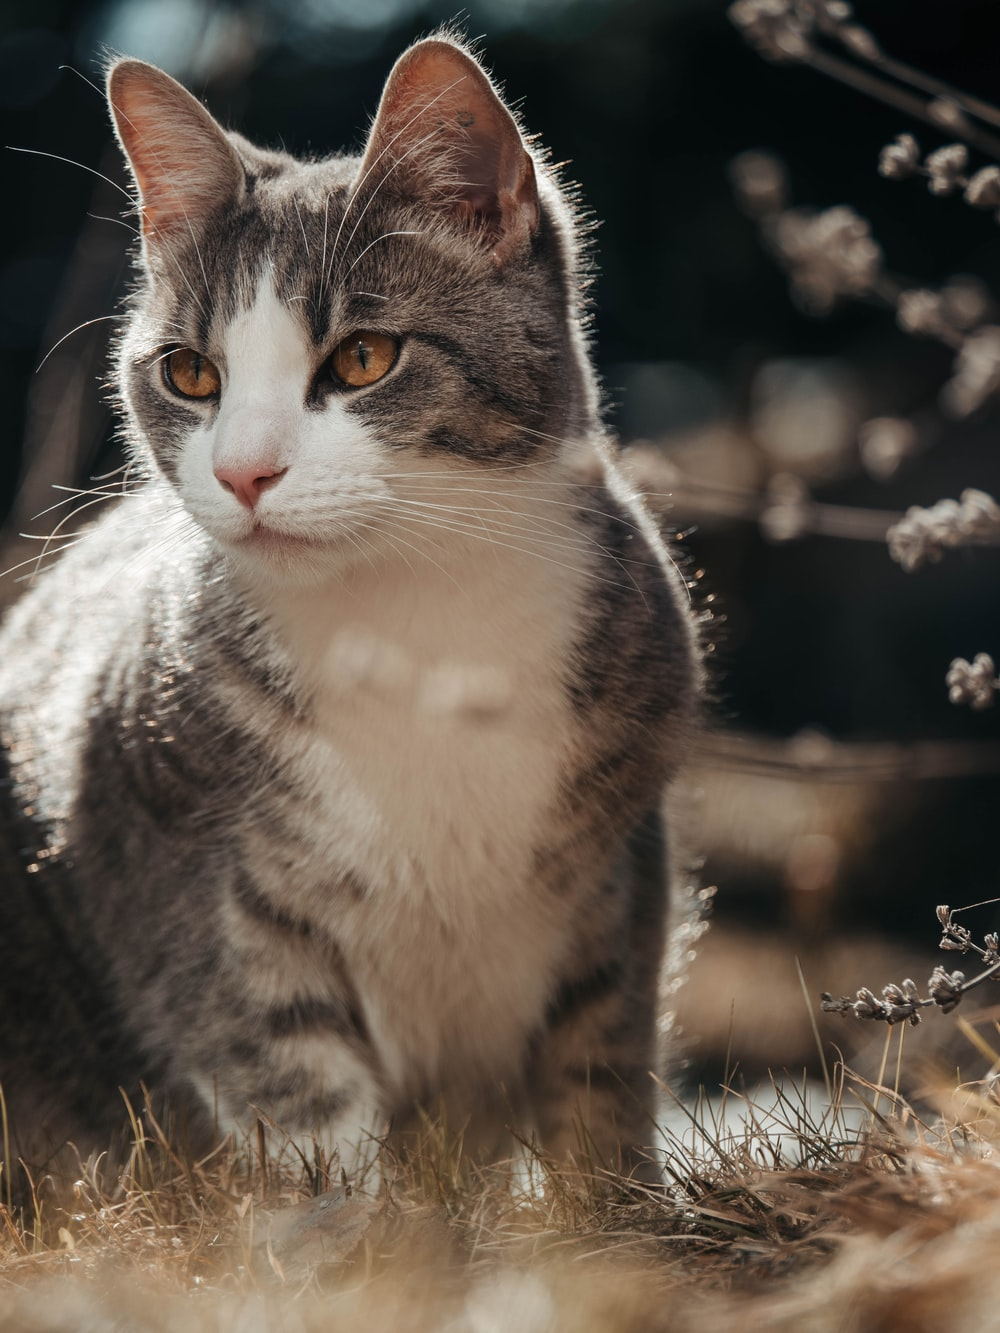 closeup photo of gray cat sitting on grass